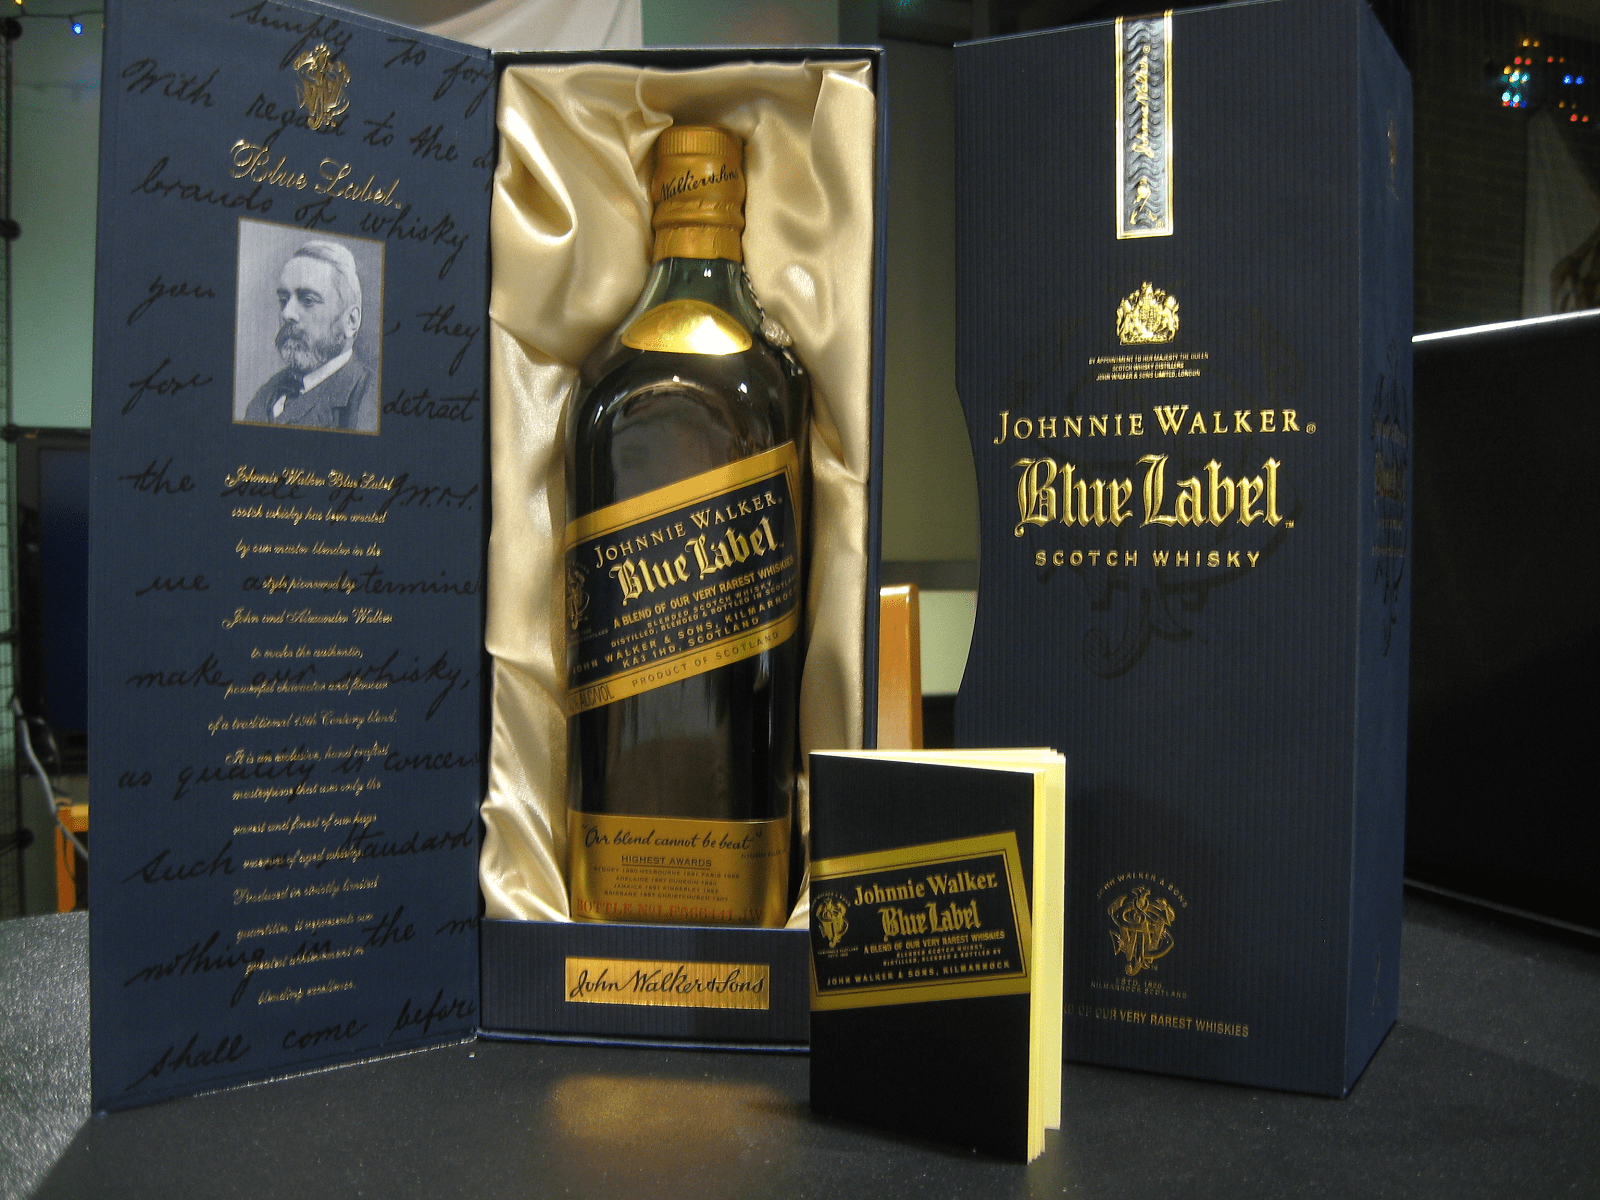 Ассортимент виски джонни уокер: red label, blue label